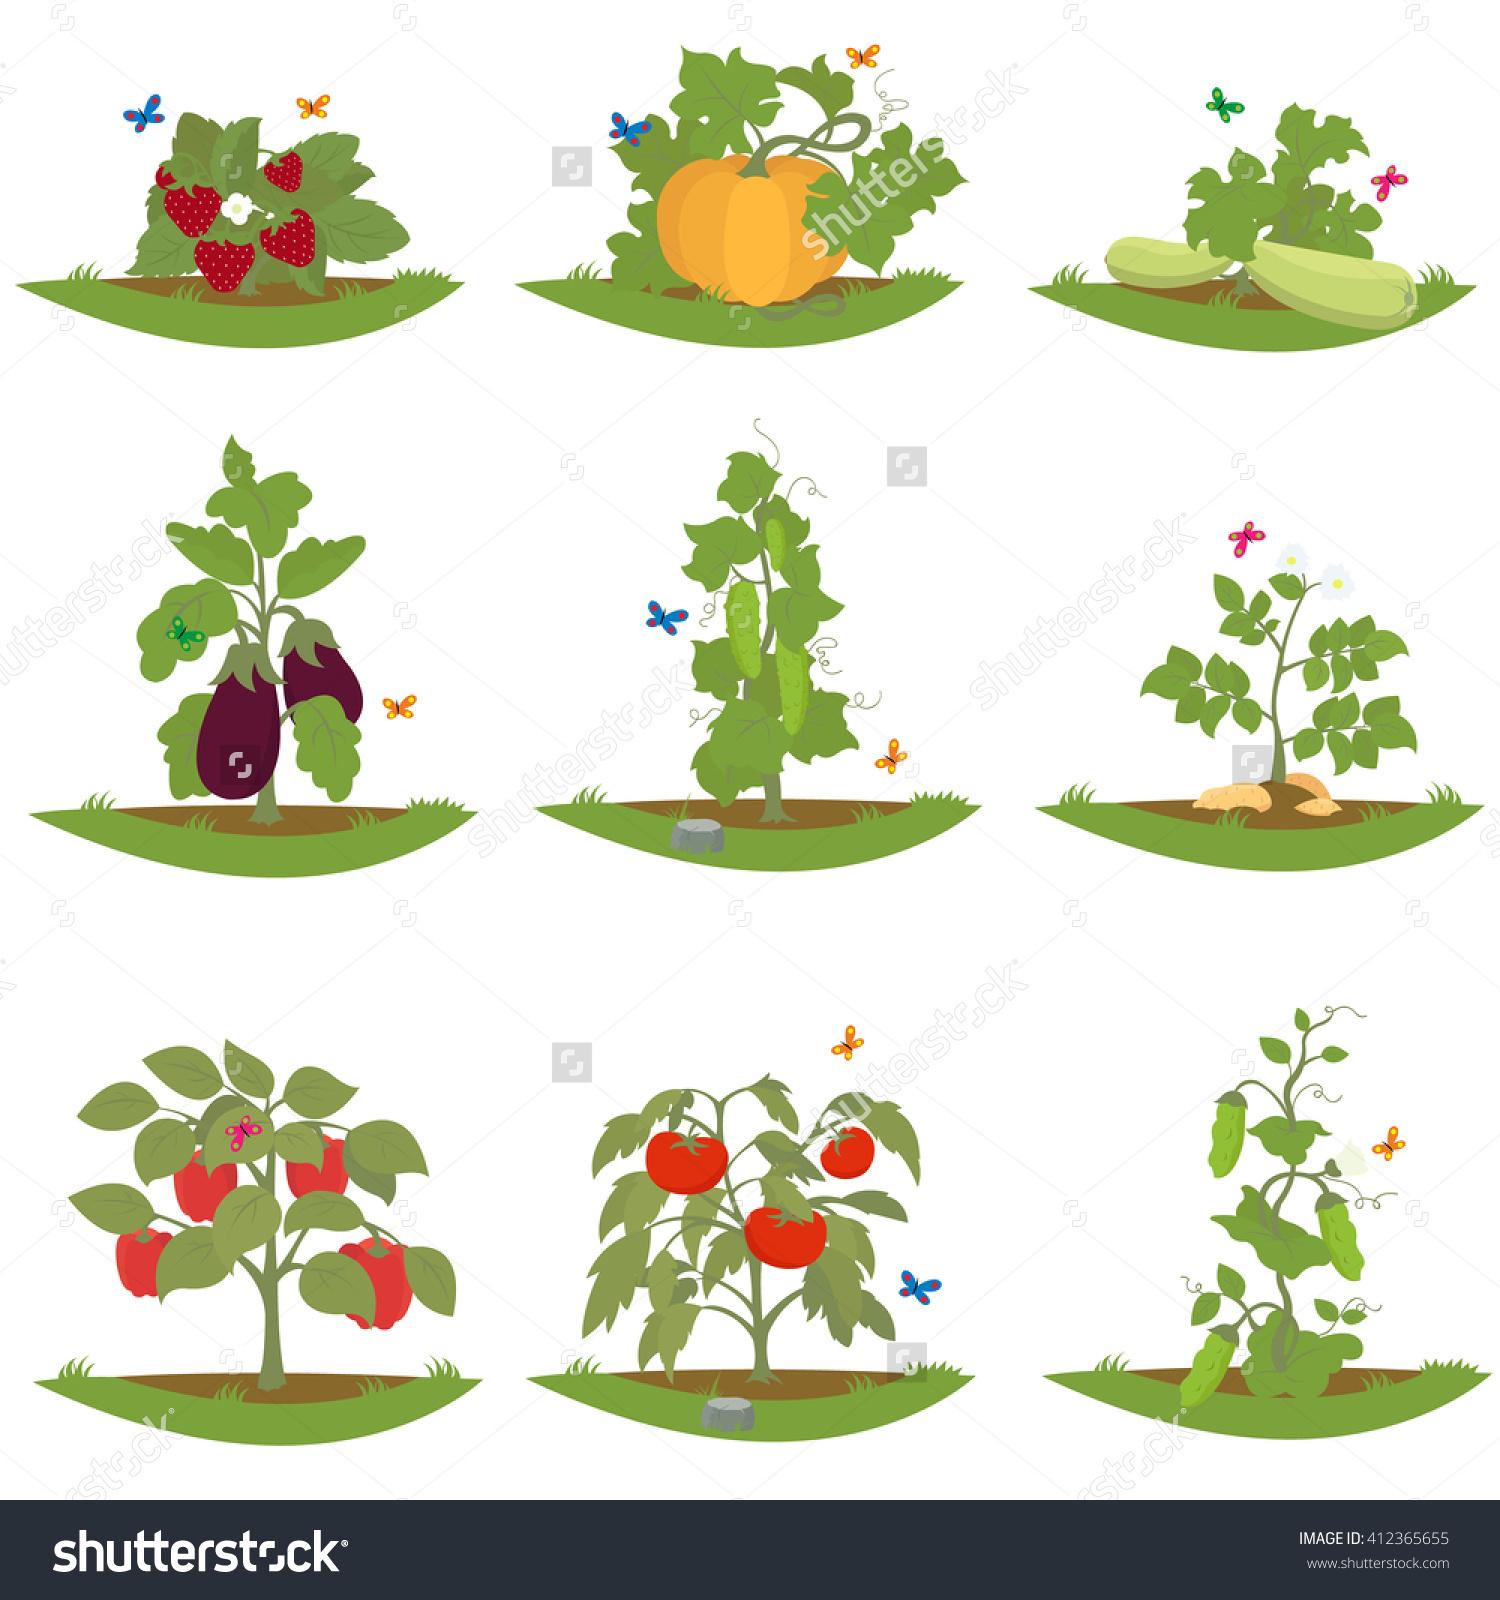 Fruits plants clipground bush. Bushes clipart vector